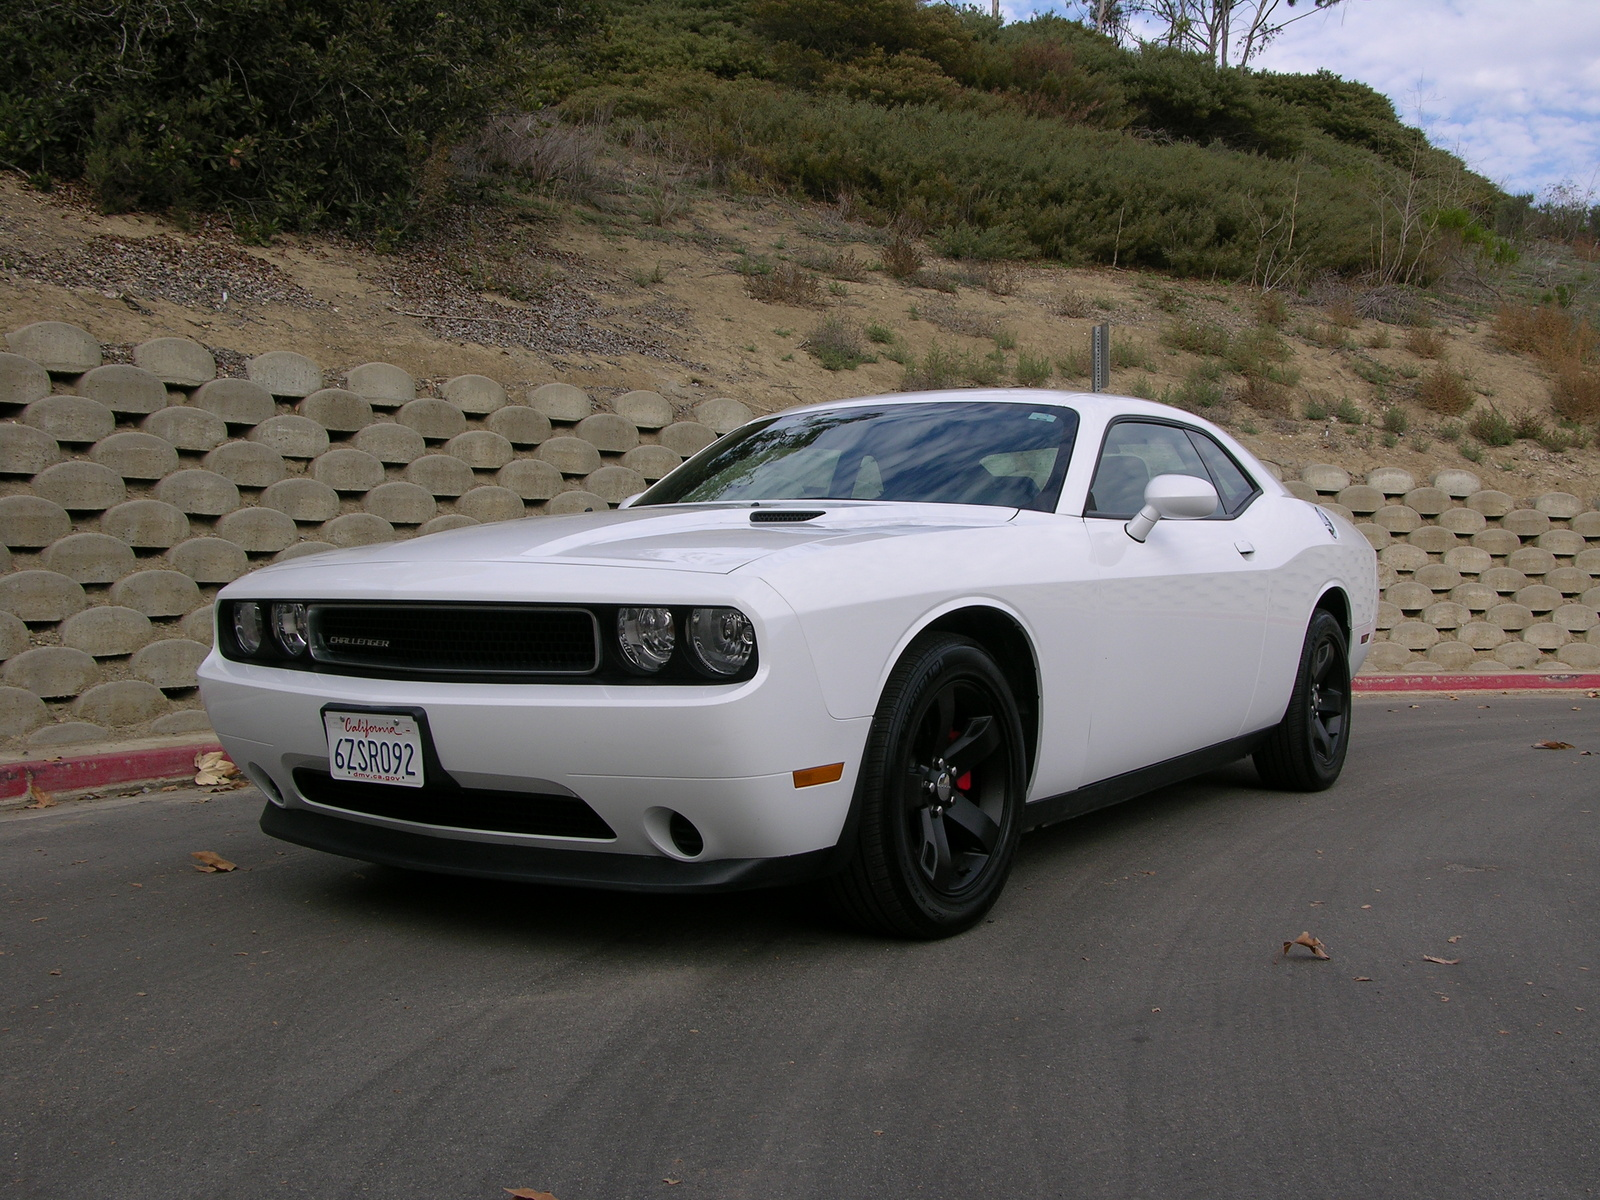 2013 Dodge Challenger Pictures Cargurus